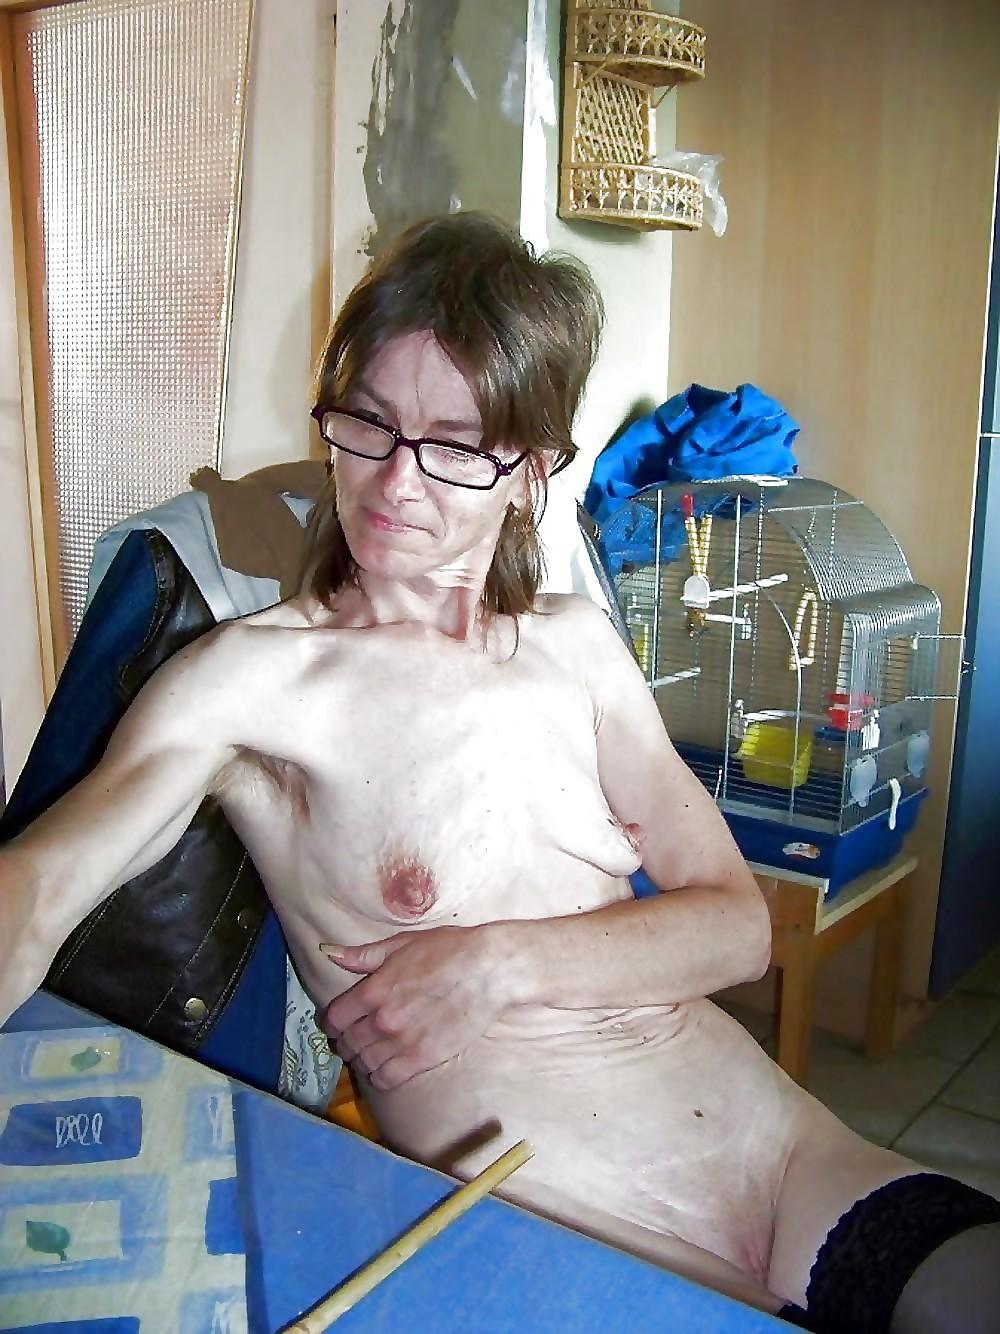 Skinny ugly sluts naked, pink shaved drill